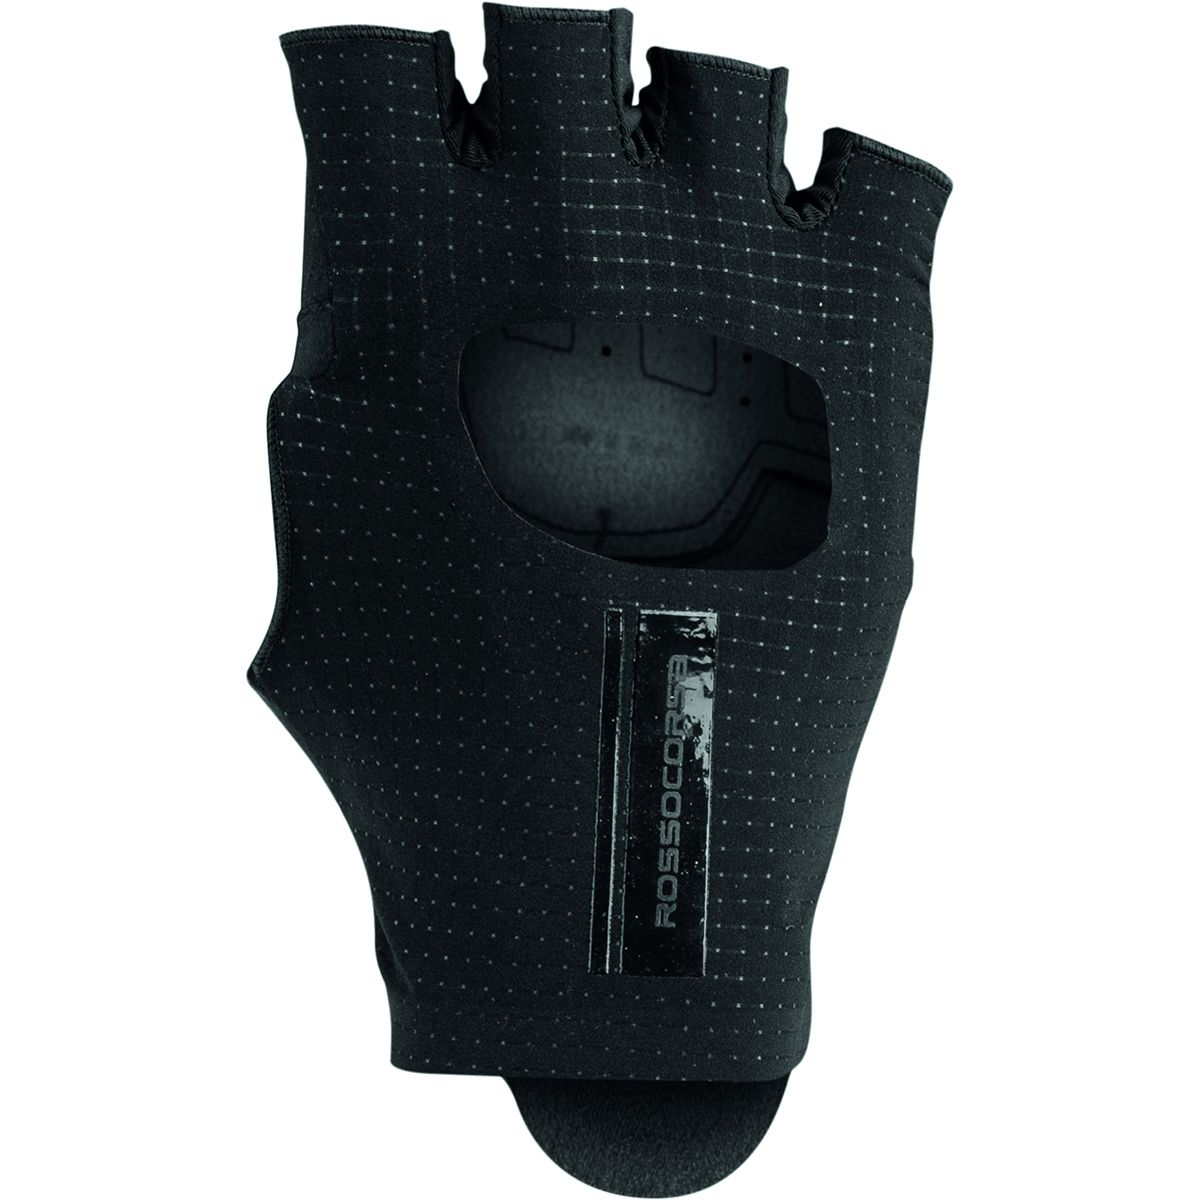 Castelli-Cabrio-Glove-Men-039-s miniature 9